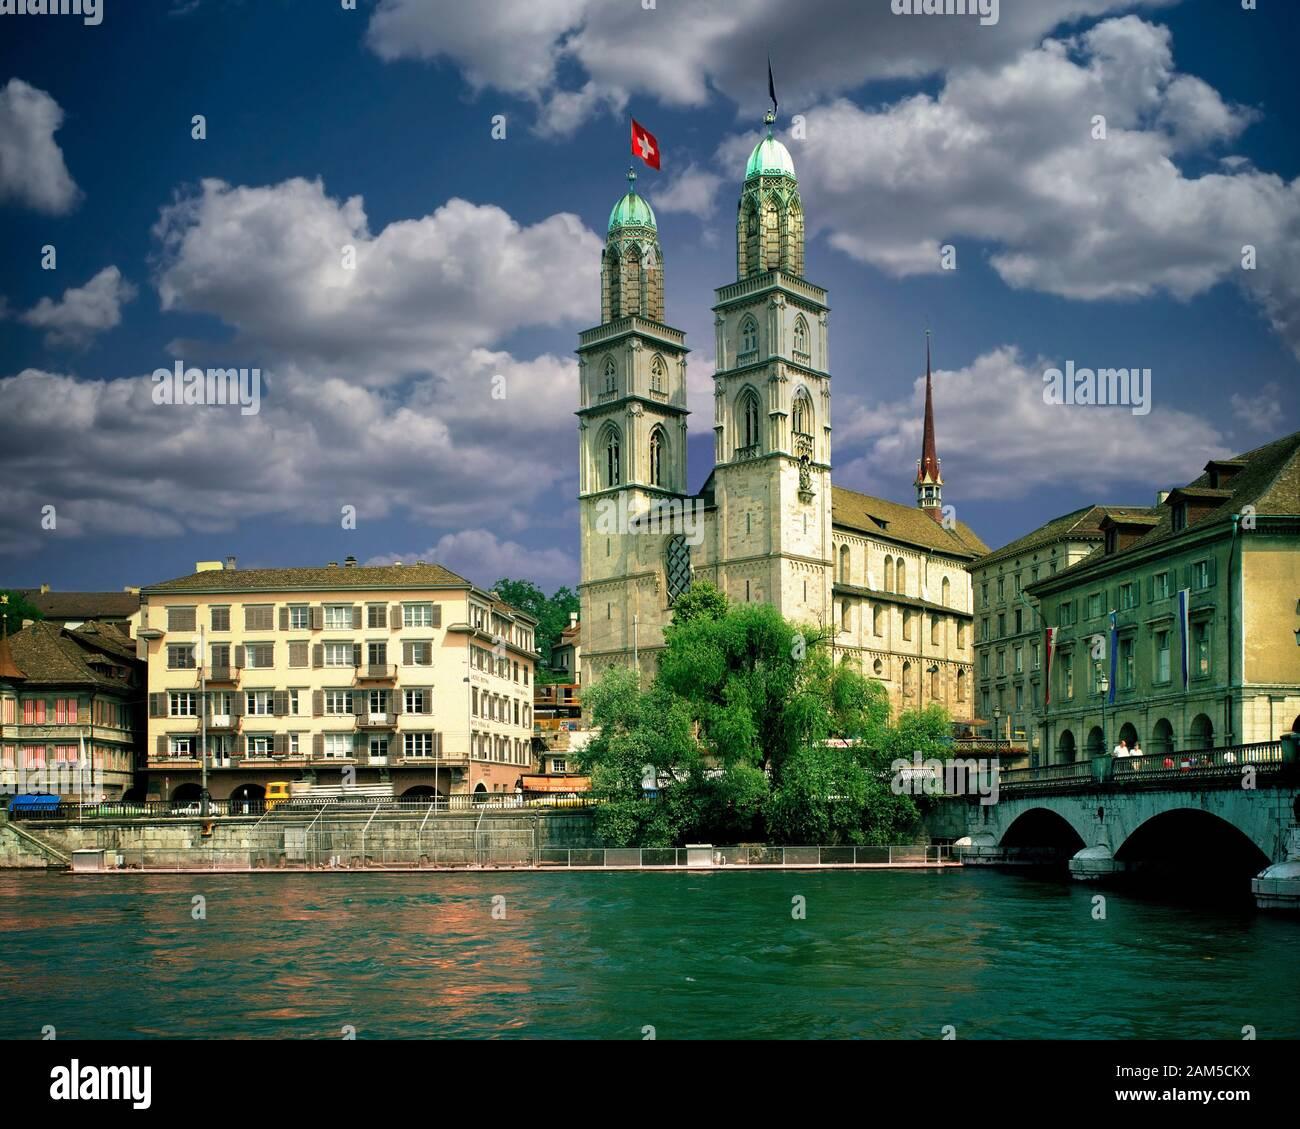 CH - Zuerich: Grossmünster (cattedrale) e il fiume Limmat Foto Stock